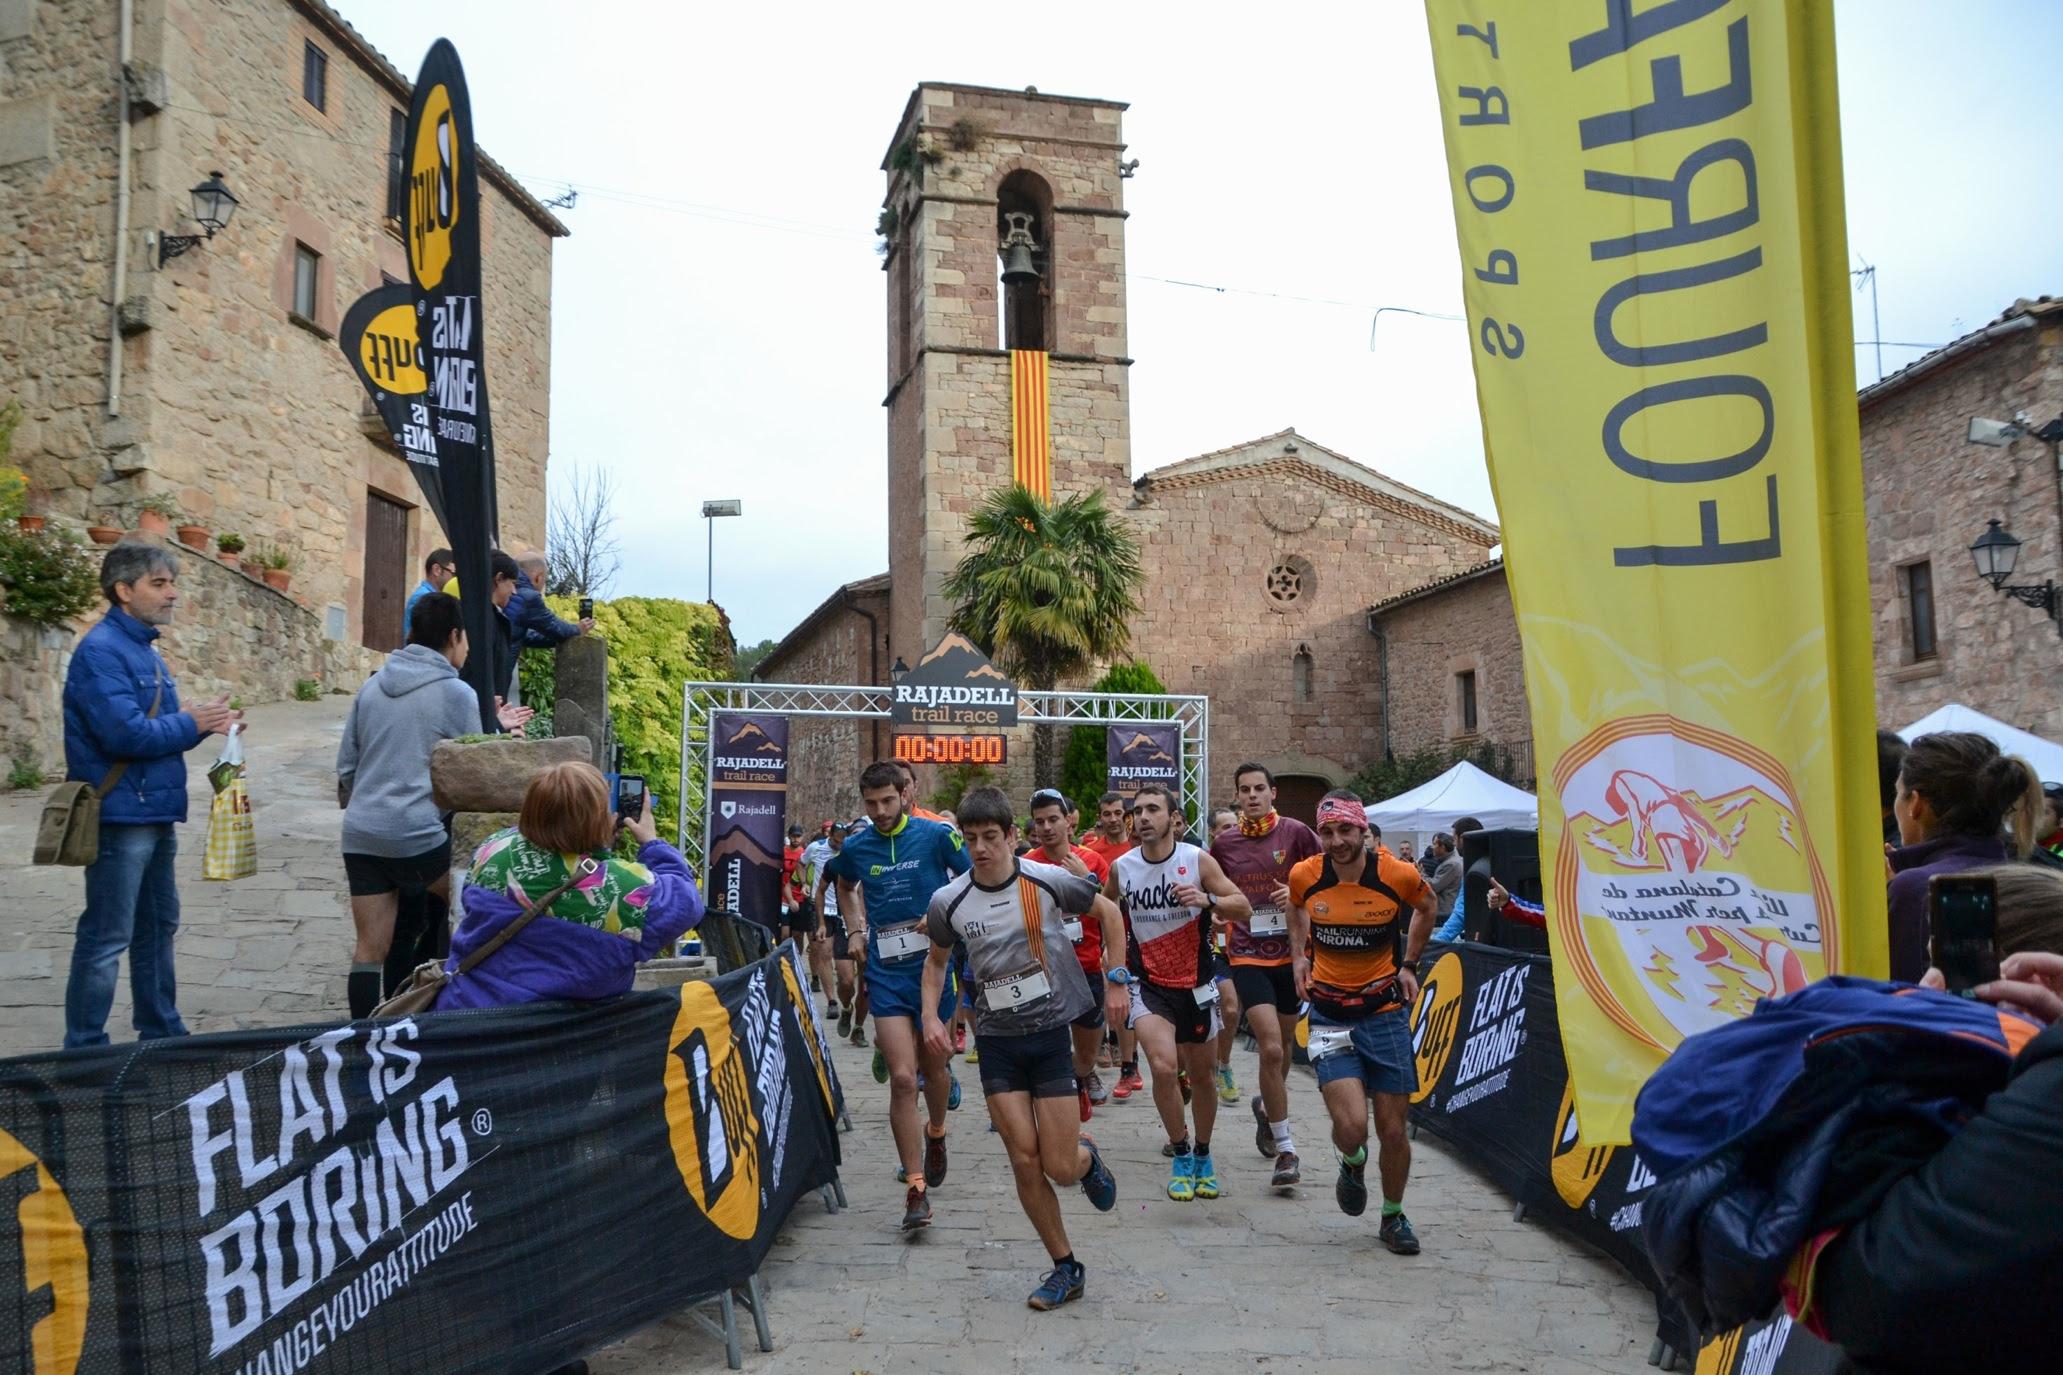 Andreu Simon y Gemma Colomé vencen en la Rajadell Trail Race y se imponen en la Lliga Catalana de Curses de Muntanya